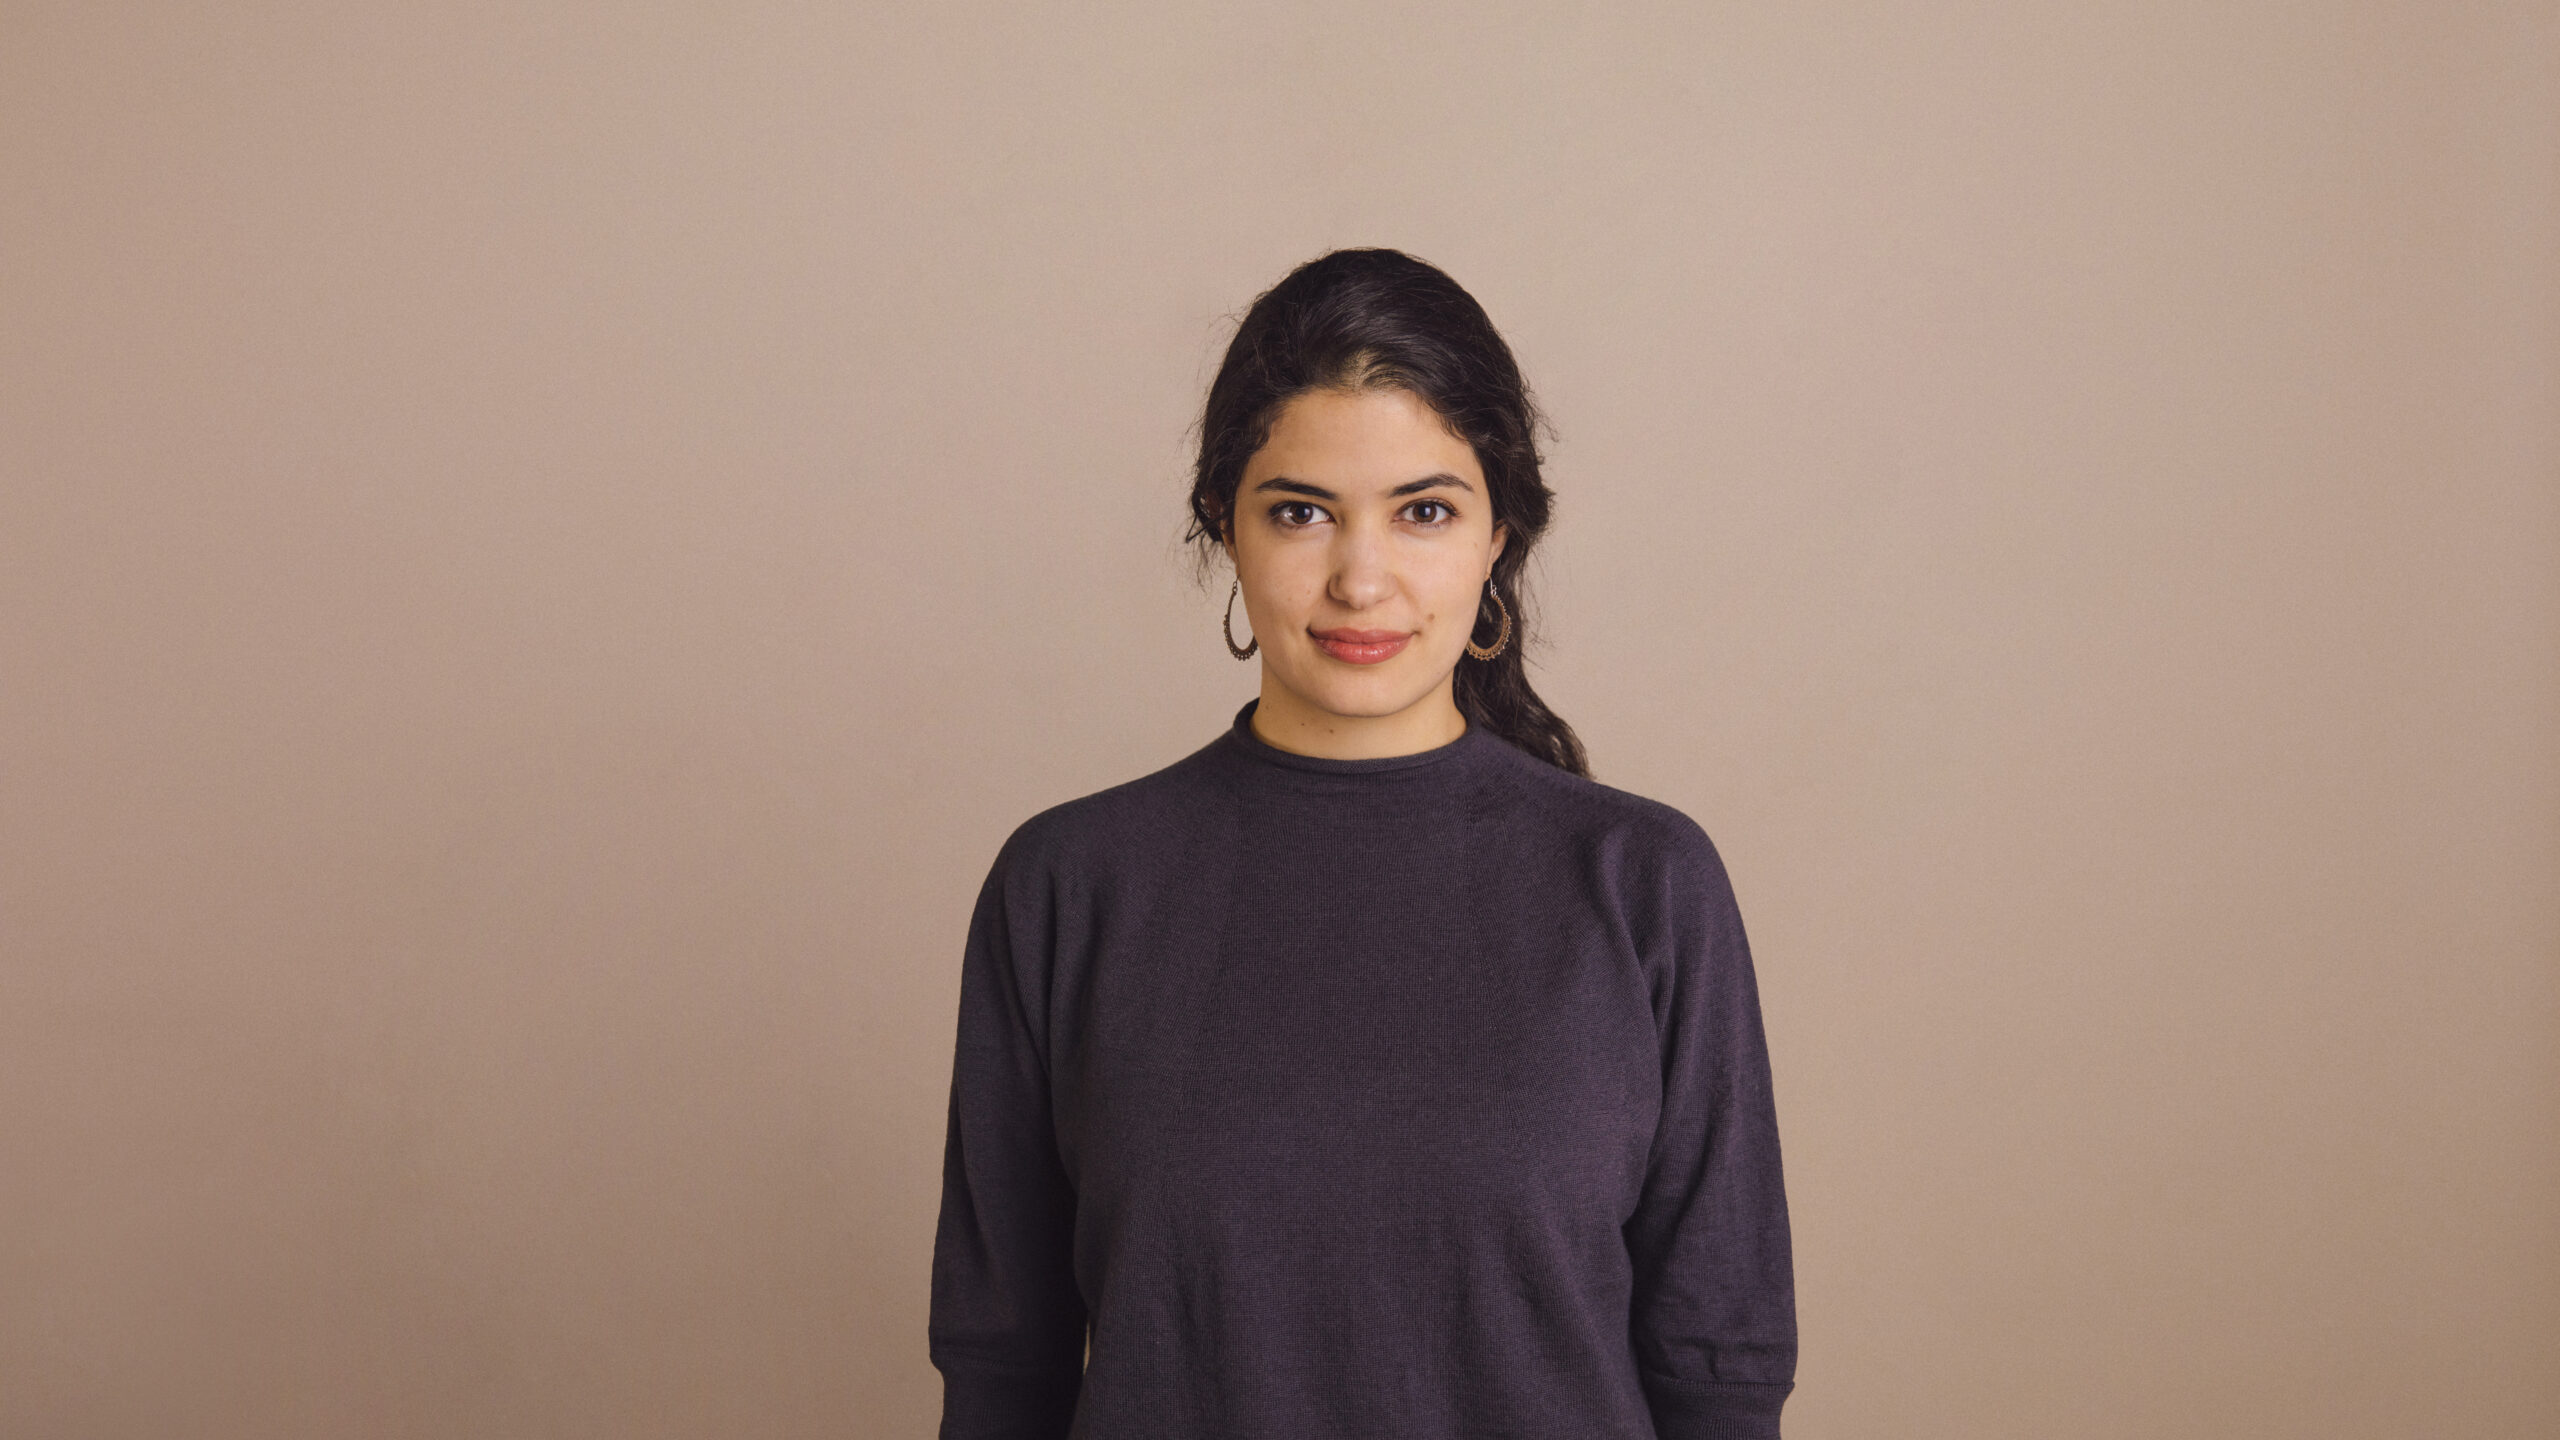 Nabila Abdel Aziz